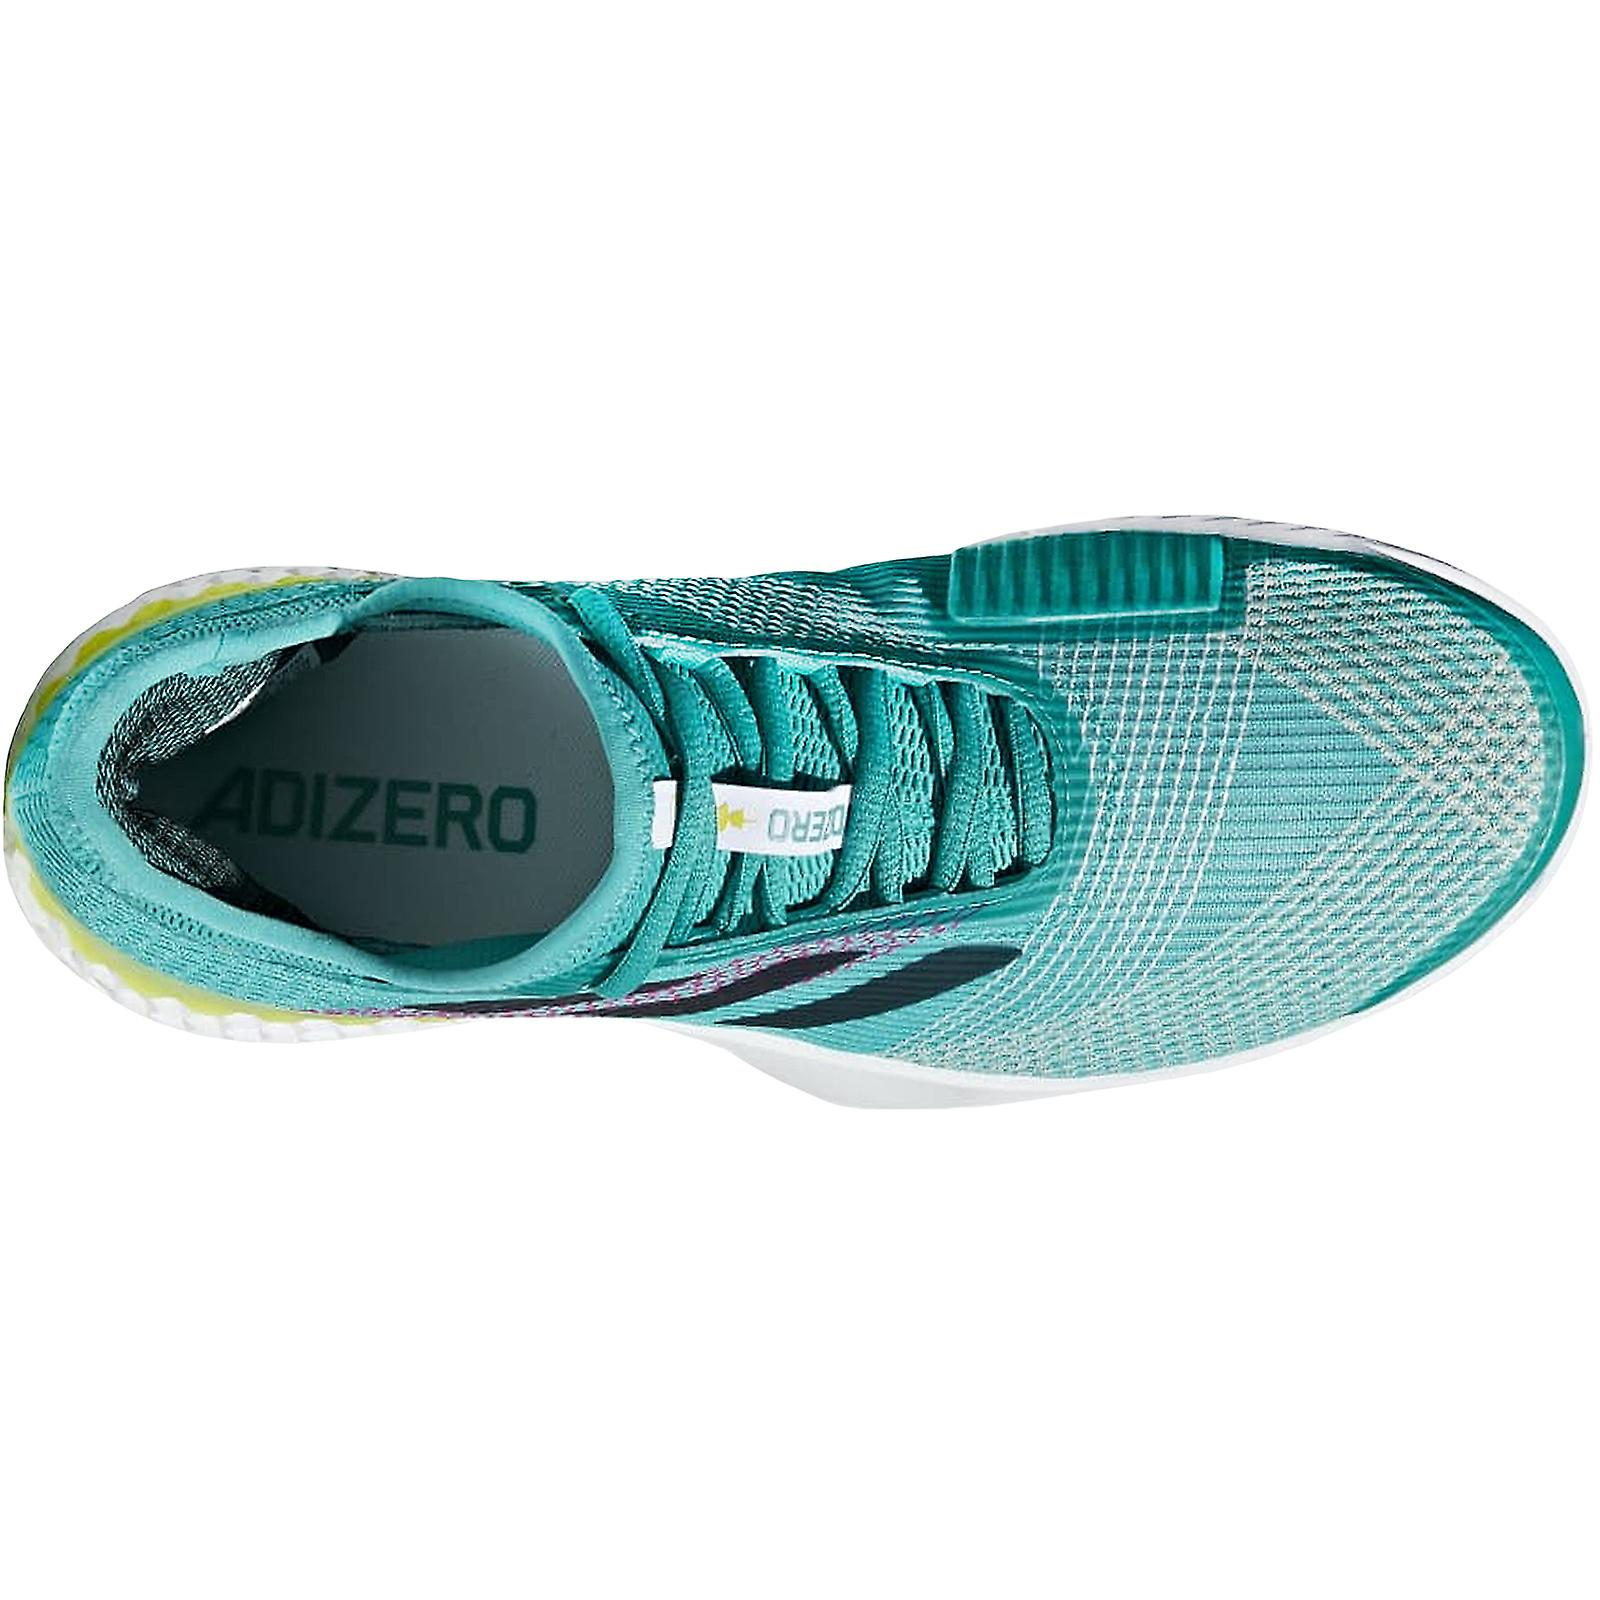 Adidas Performance menns adizero Ubersonic indoor Court tennis trenere-grønn - Spesiell rabatt